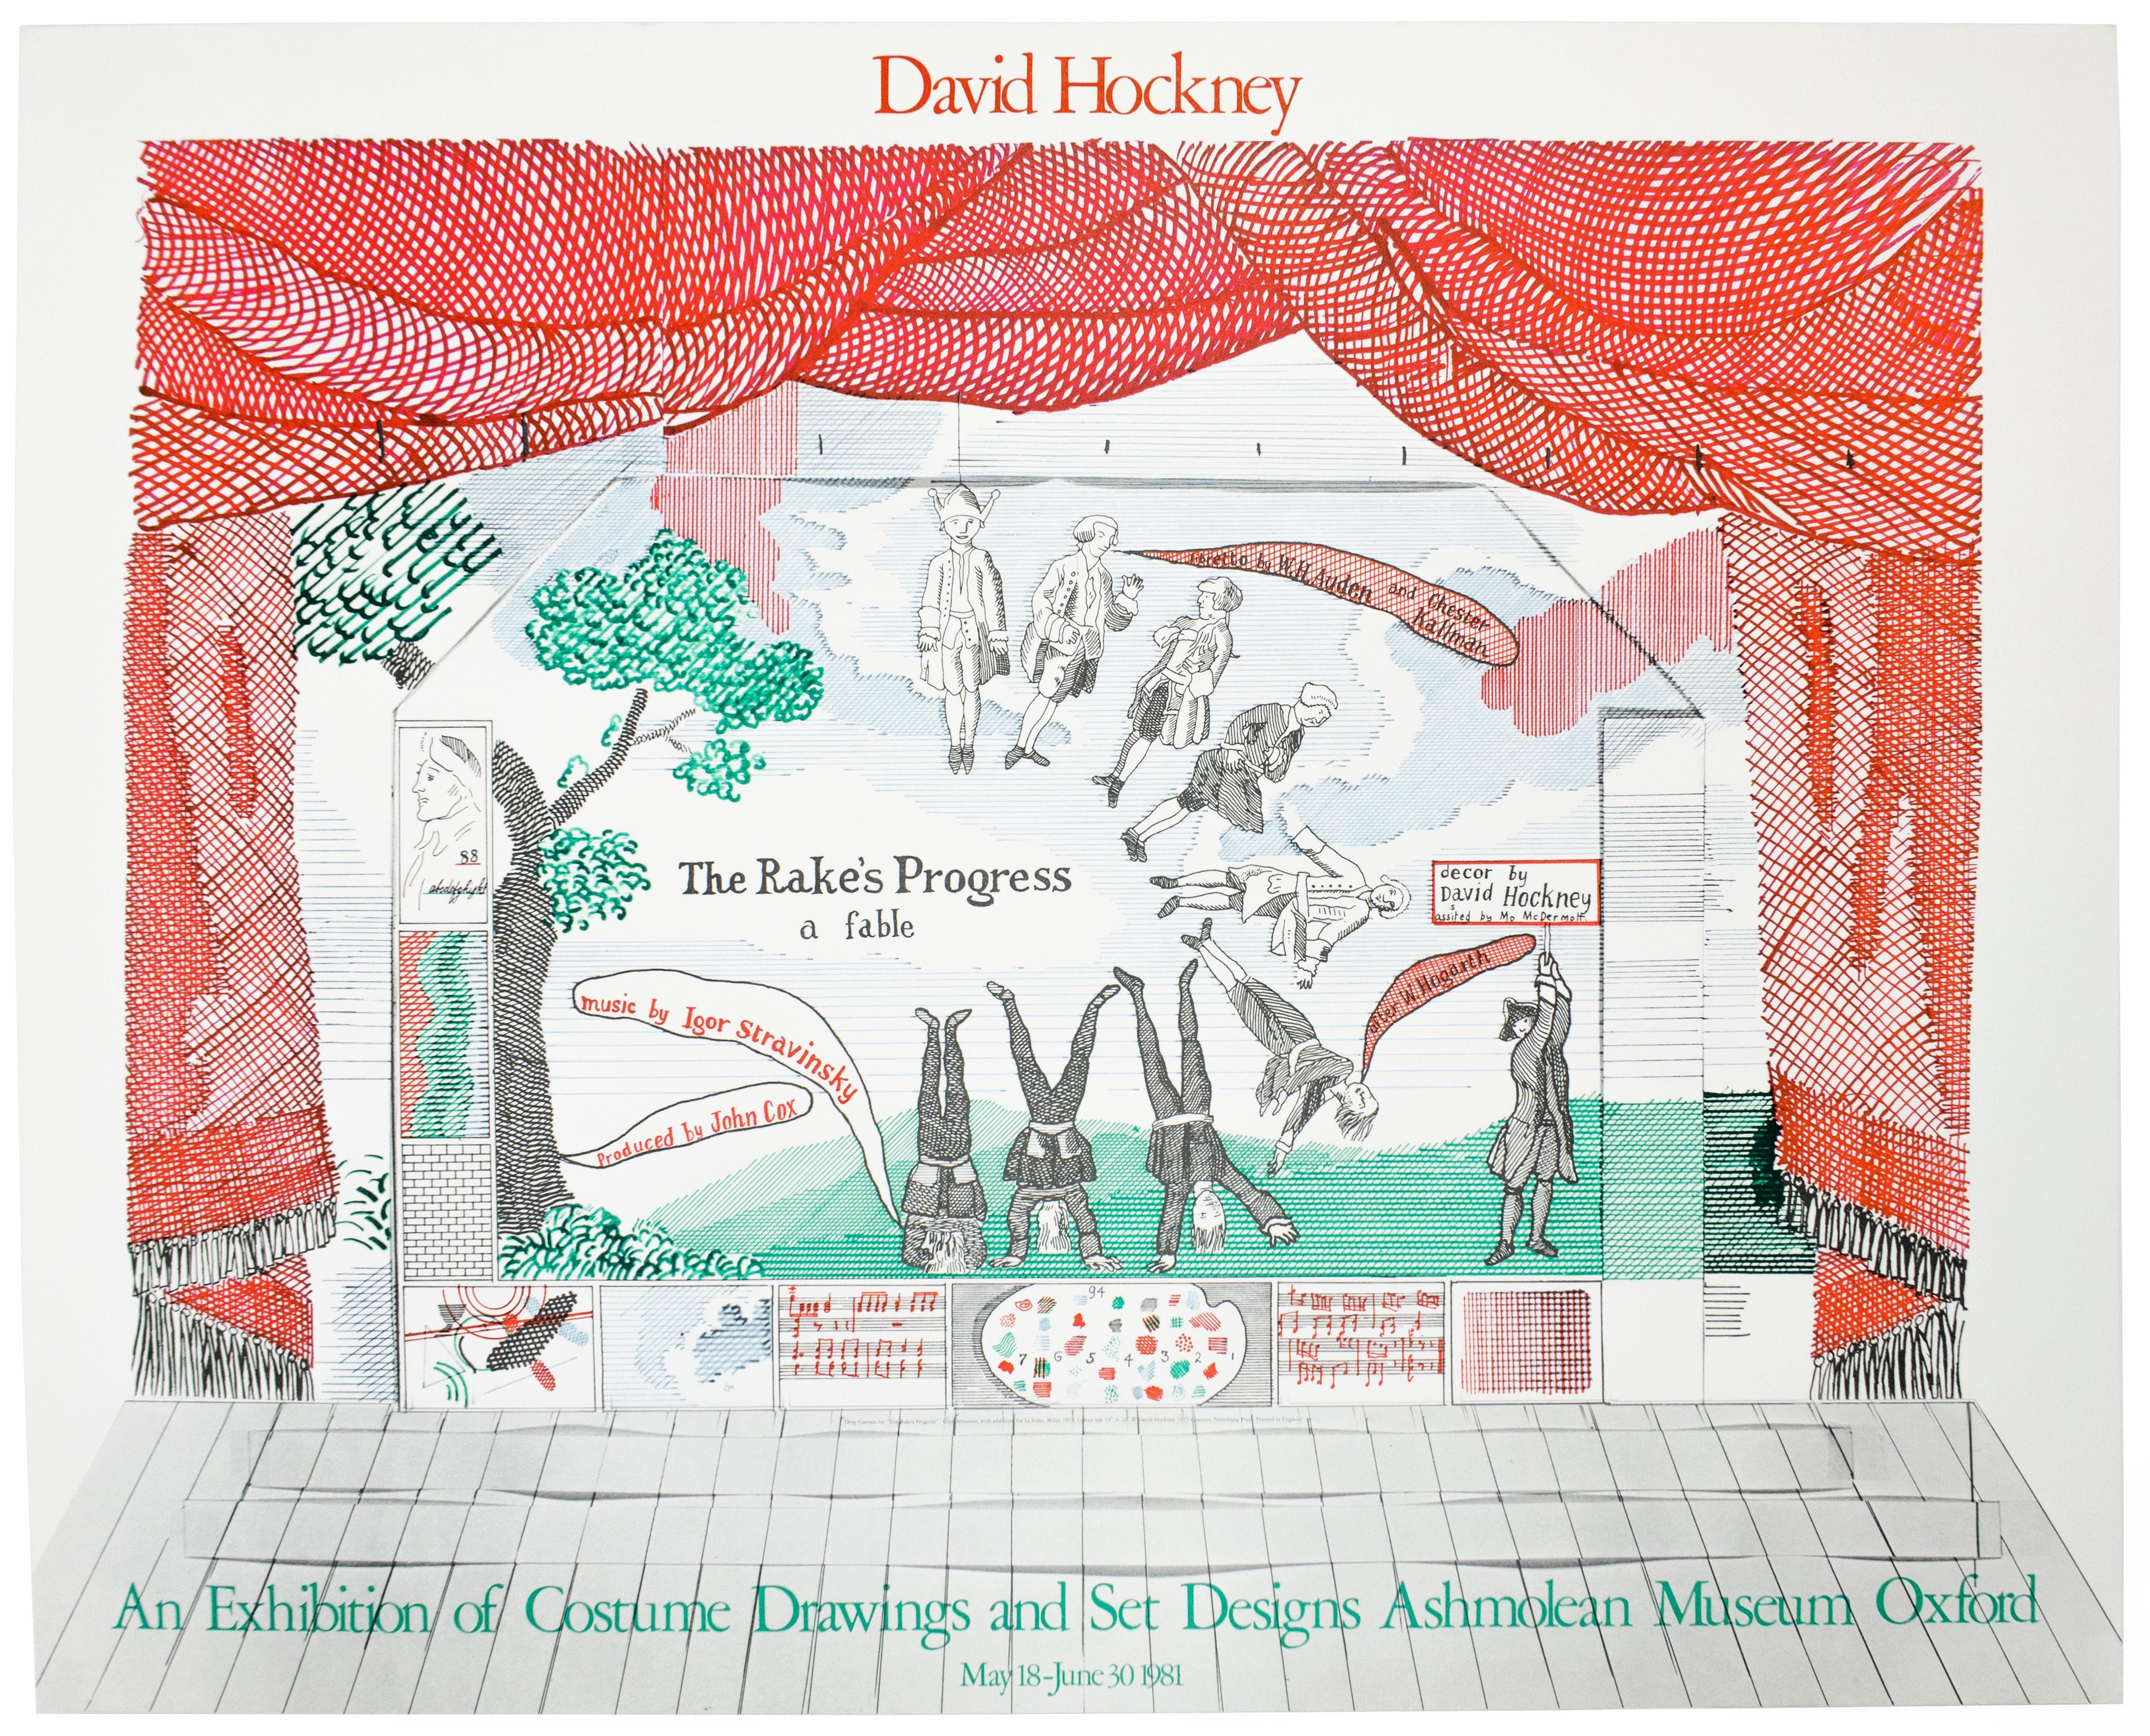 Vintage David Hockney Exhibition Poster Ashmolean Museum 1981